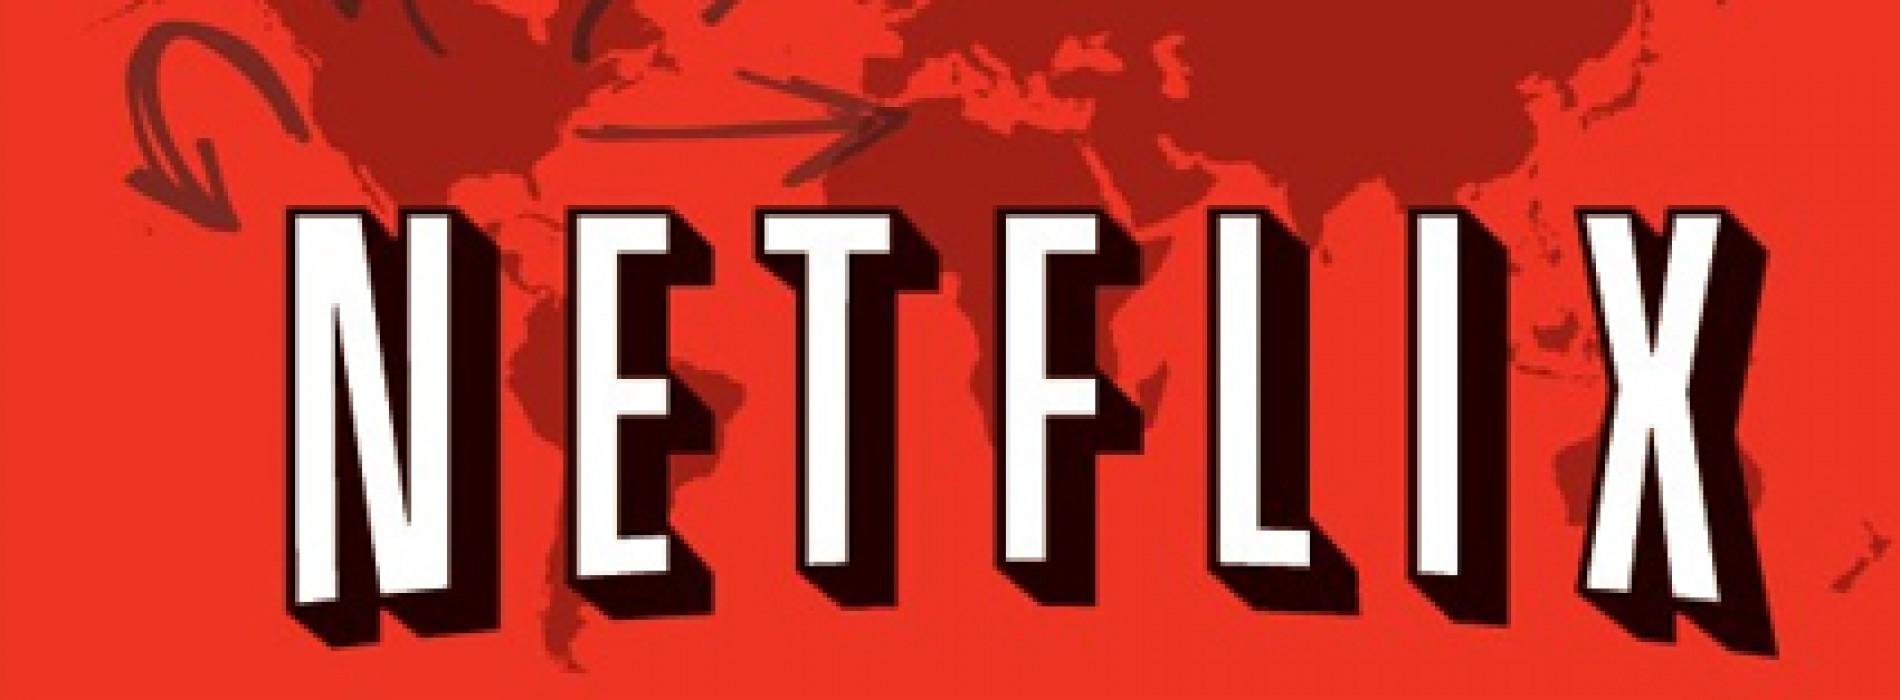 Netflix رسميا لكل العالم + معلومات و اشتراك شهر مجاني